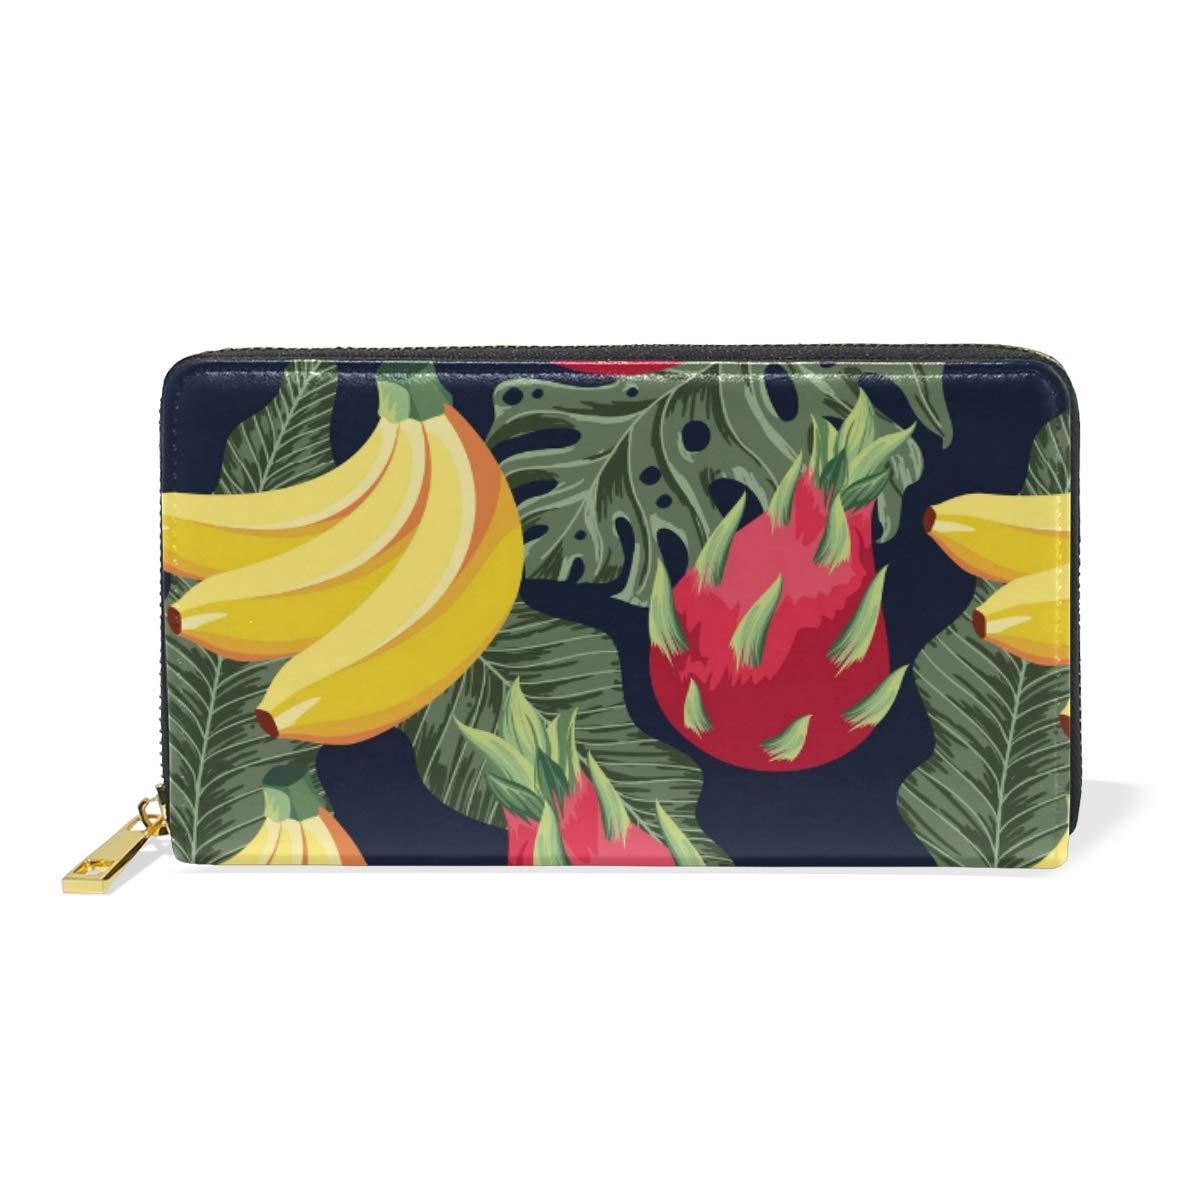 Women Wallet Coin Purse Phone Clutch Pouch Cash Bag Female Girl Card Change Holder Organizer Storage Key Hold Leather Elegant Handbag Party Birthday Gift Plant Fruit Pattern